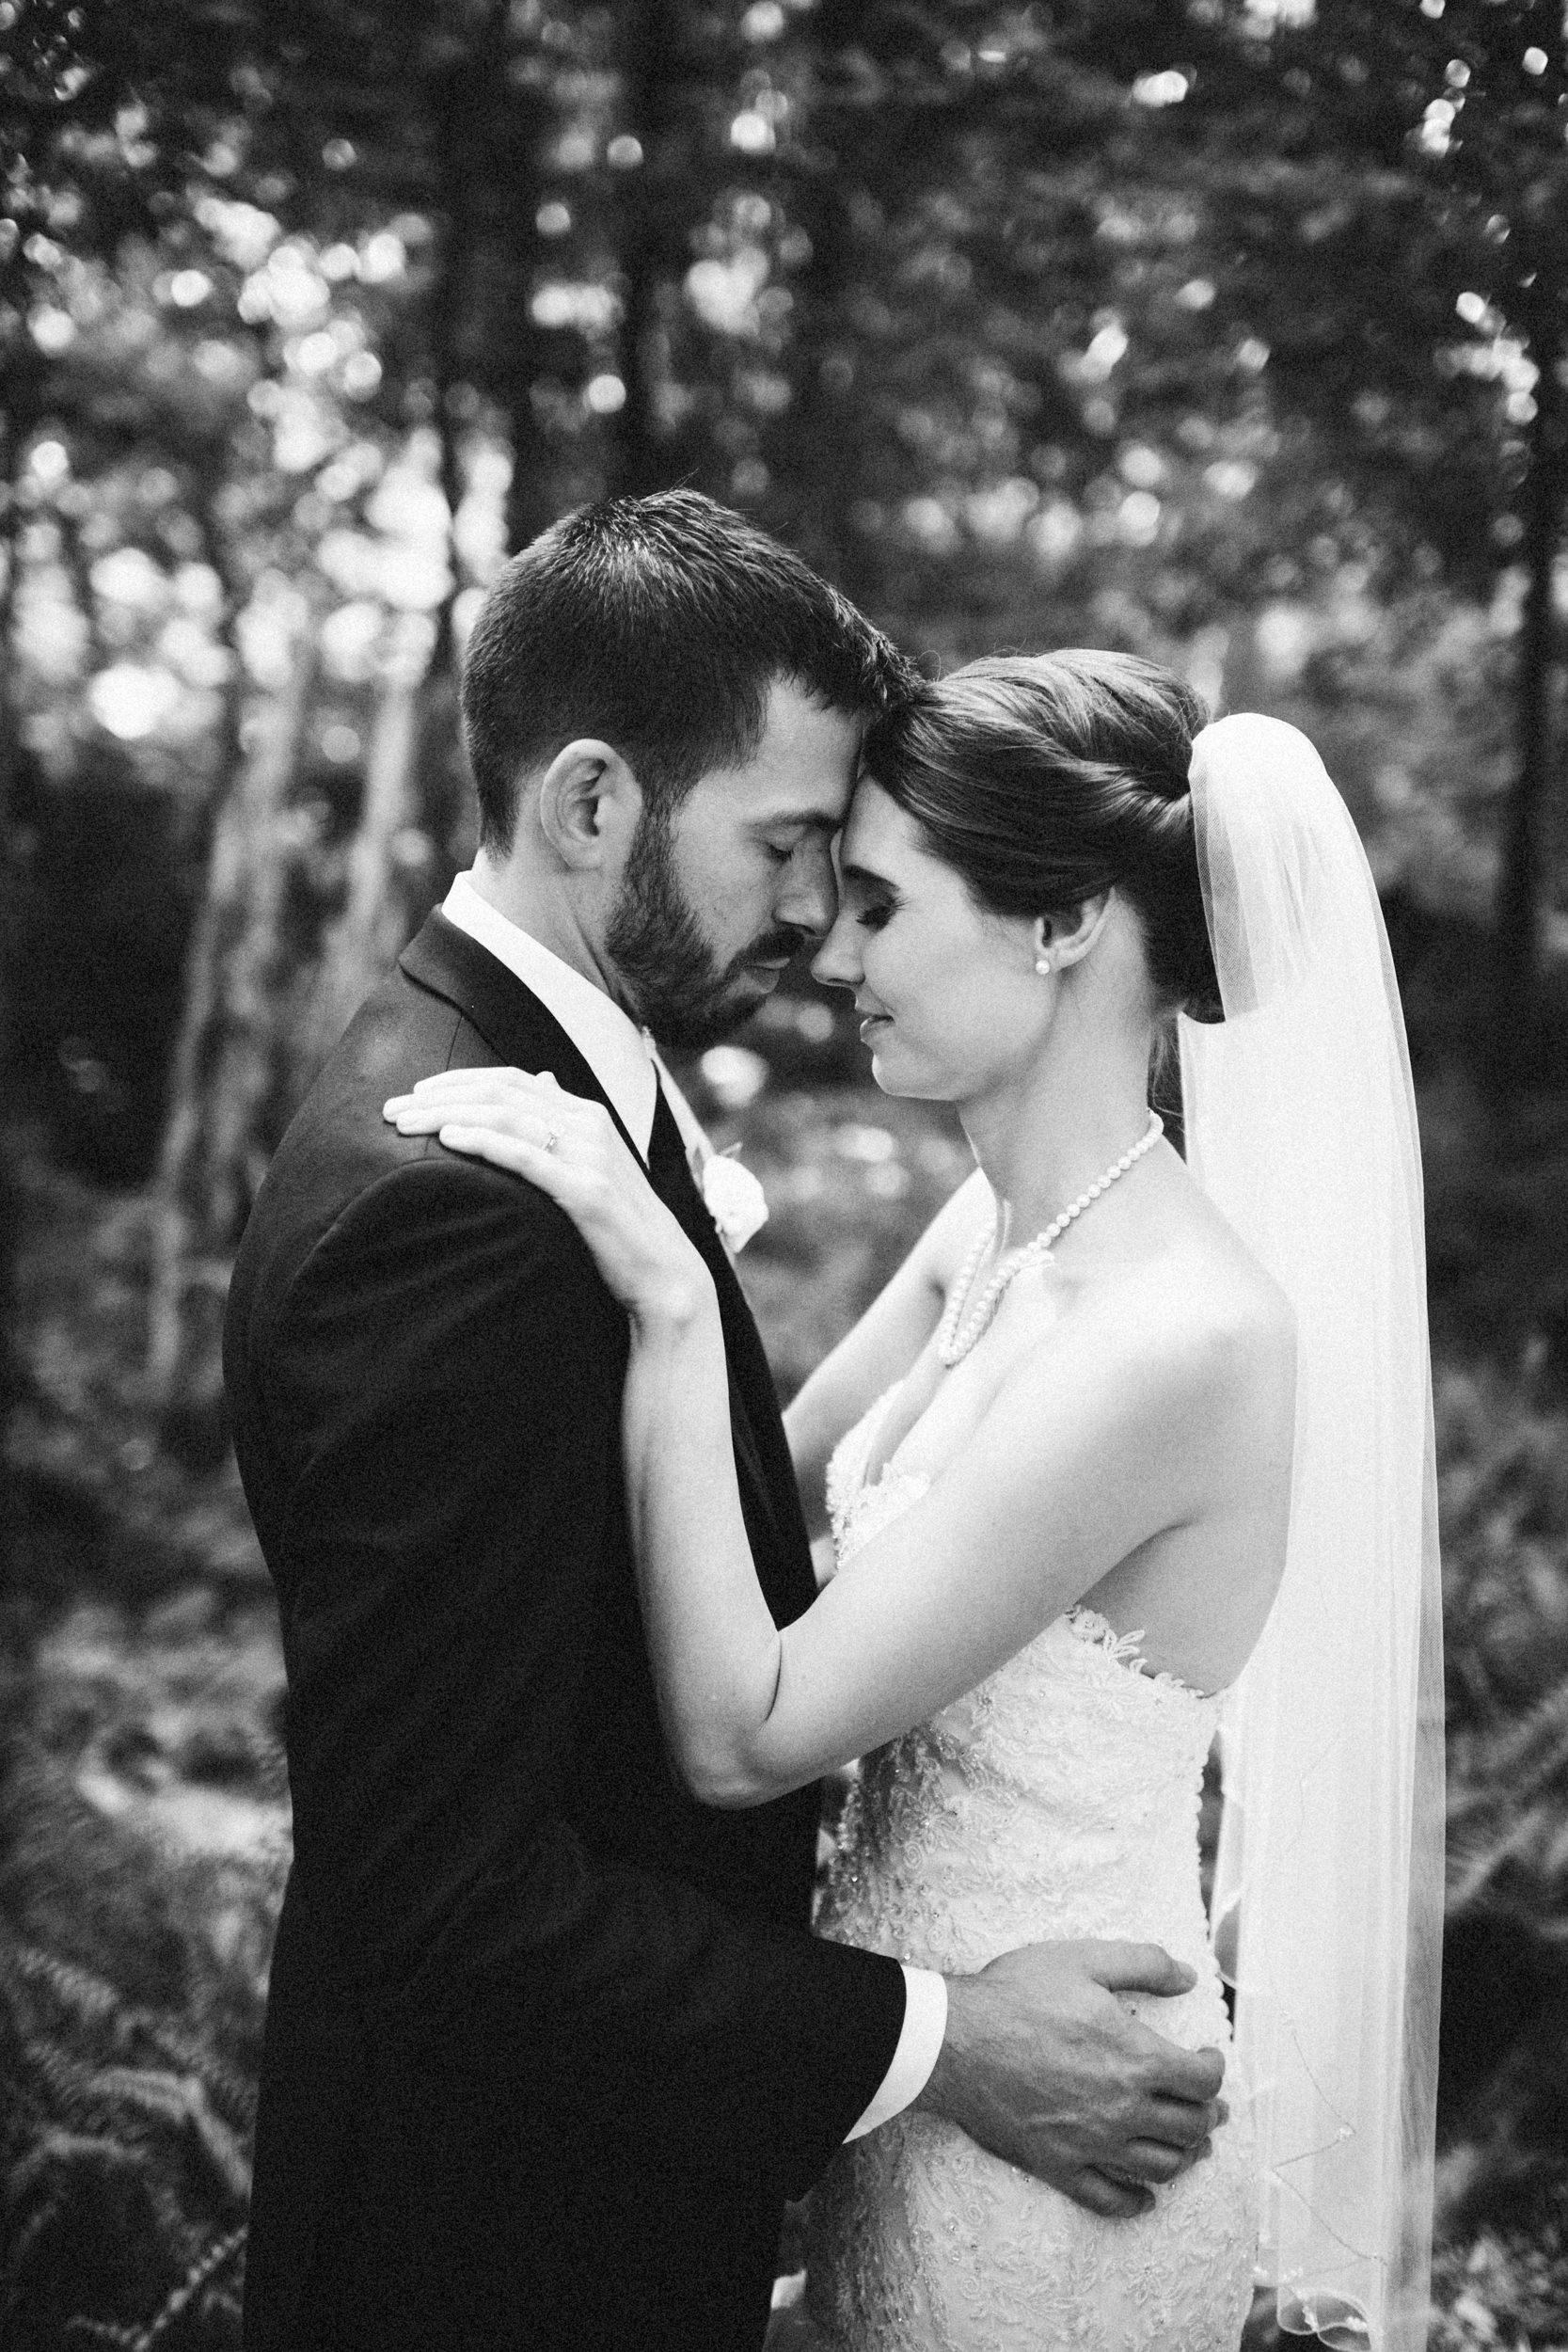 Louisville-Kentucky-Wedding-Elopement-Photographer-Sarah-Katherine-Davis-Photography-Whitehall-Classic-Timeless-Garden-Wedding-511.jpg